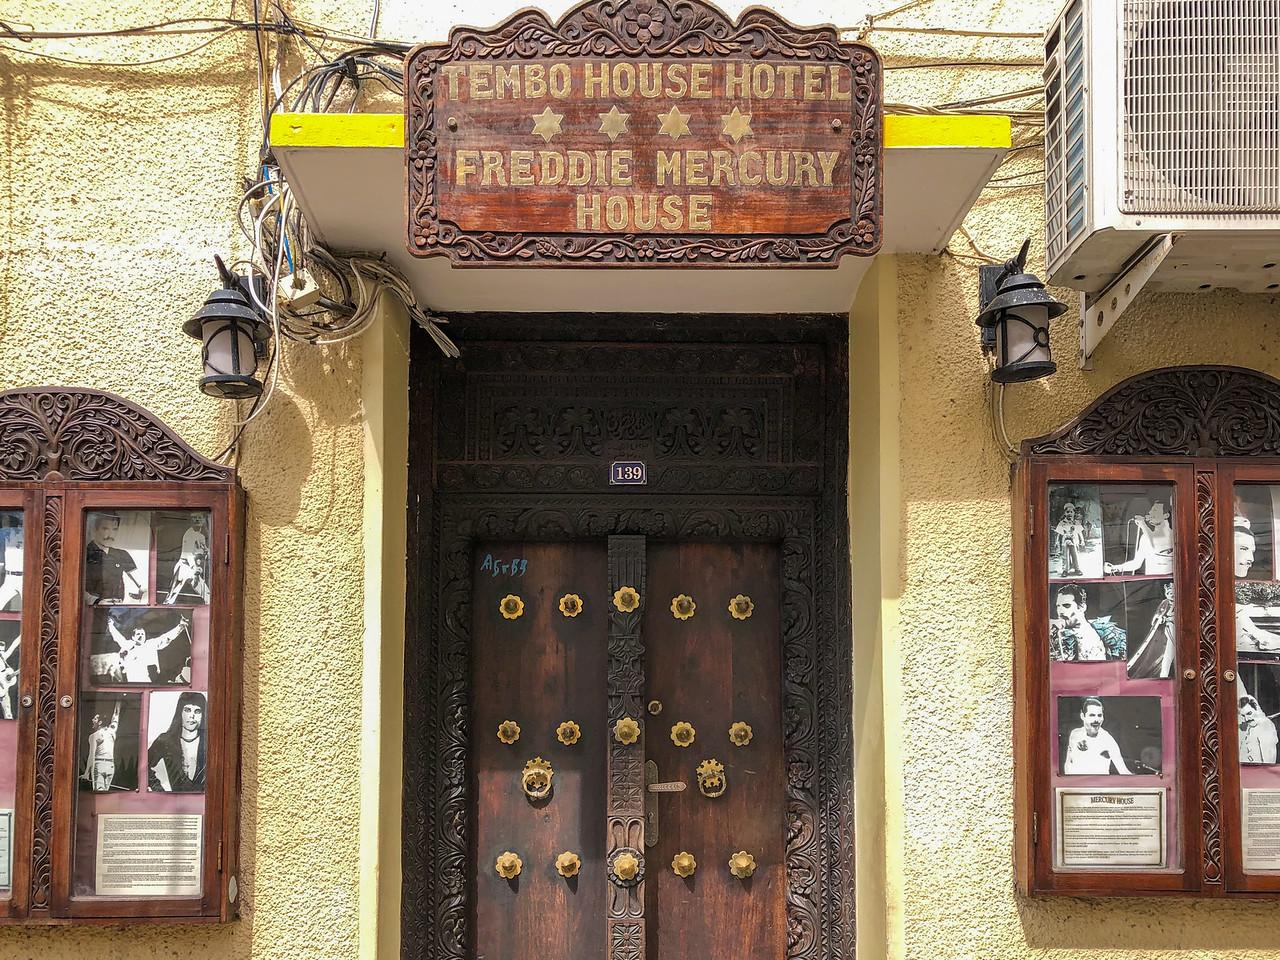 Freddie Mercury house in Zanzibar